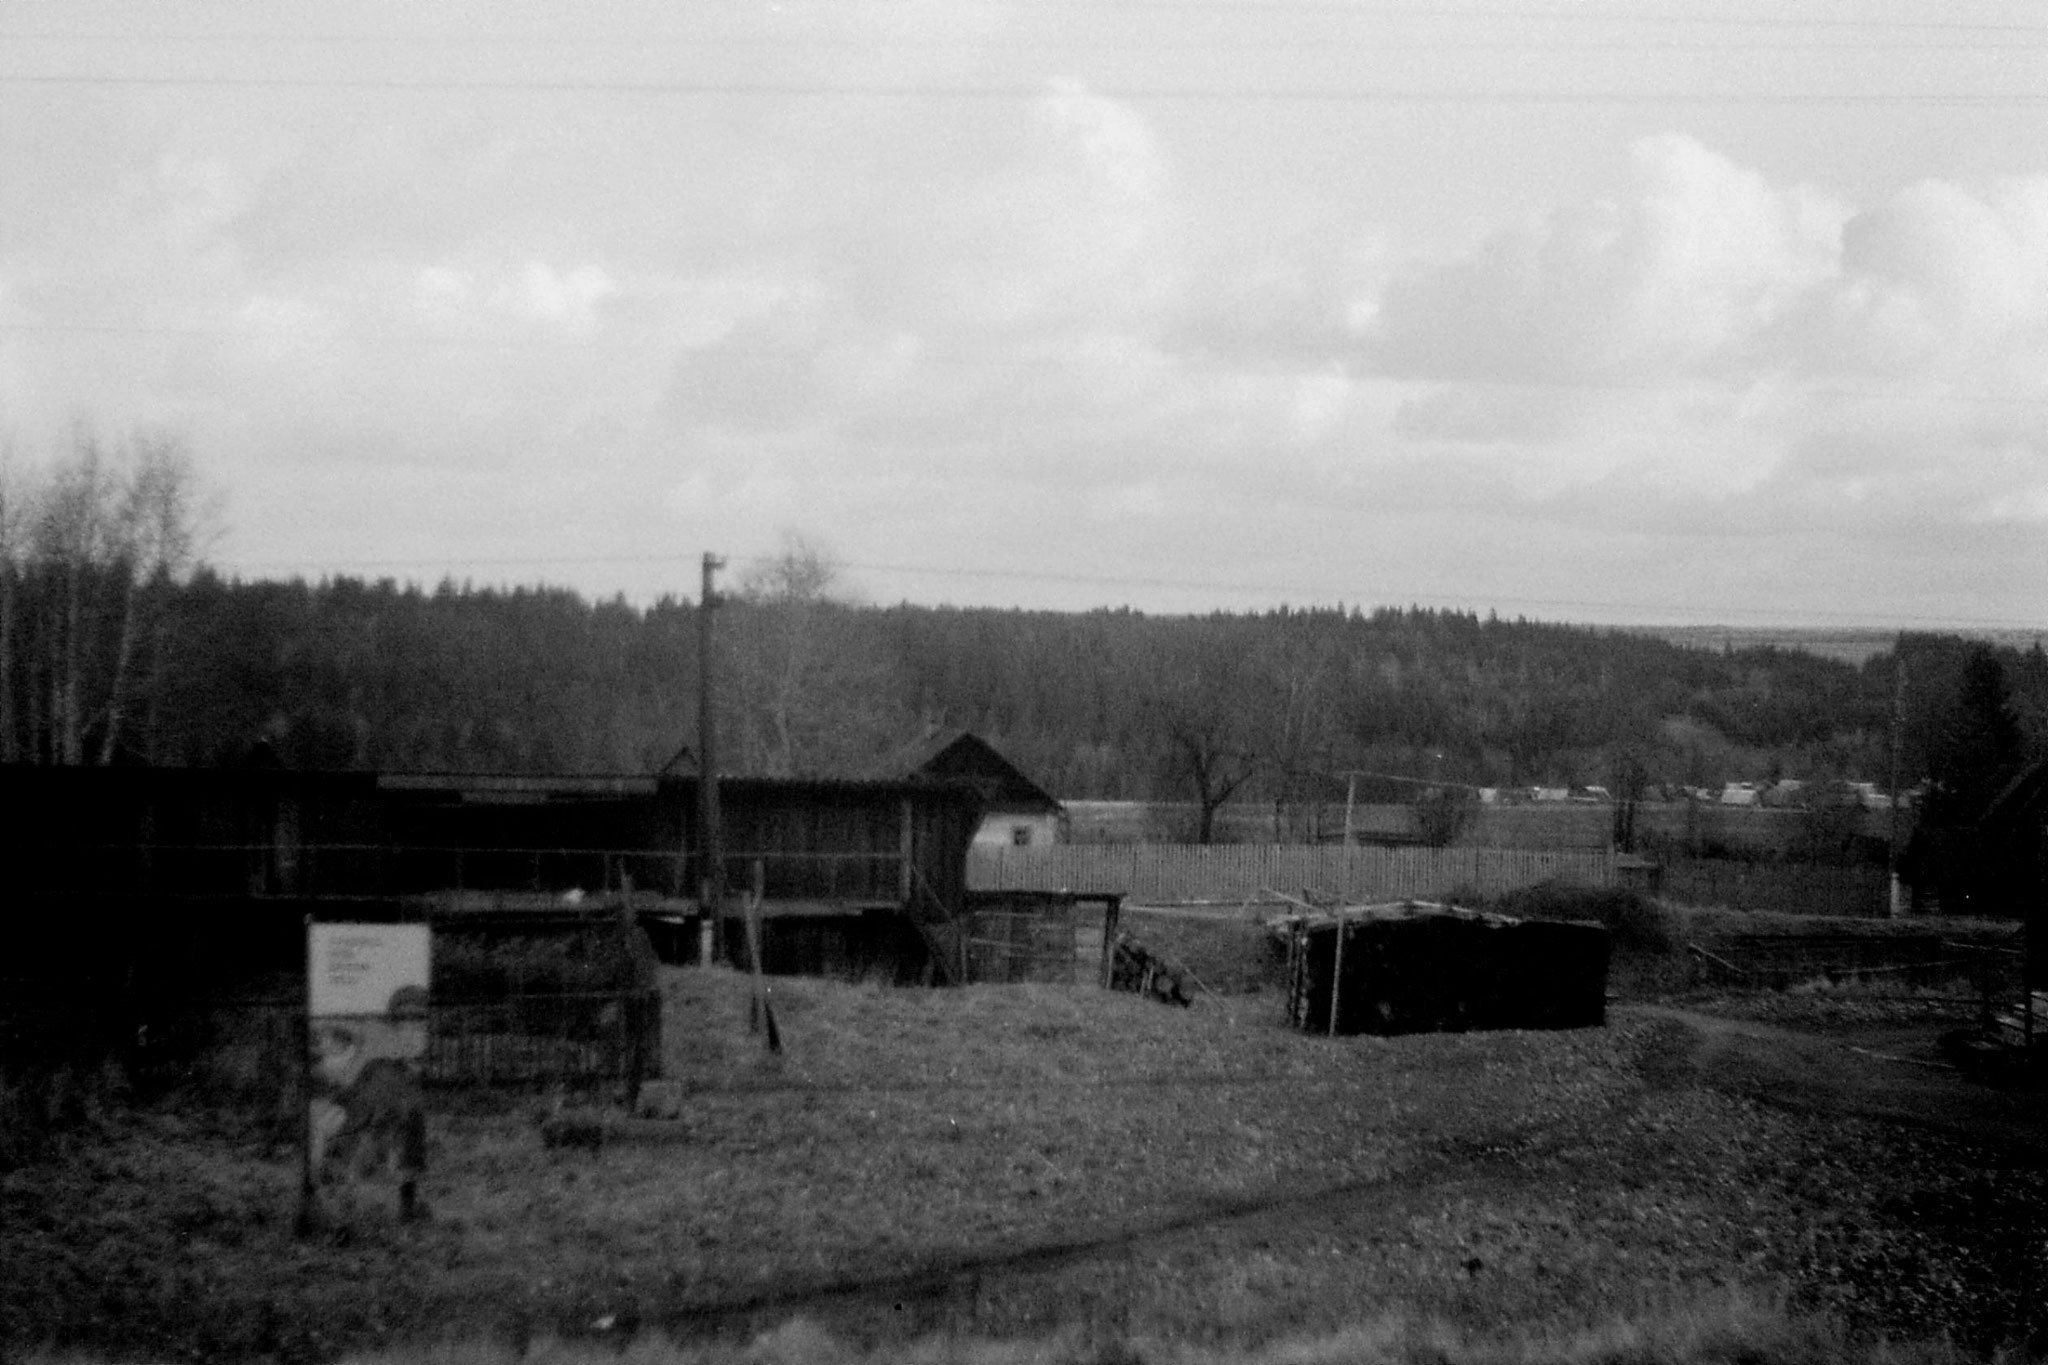 19/10/1988: 21: from Siberian Express between Balezino and Perm